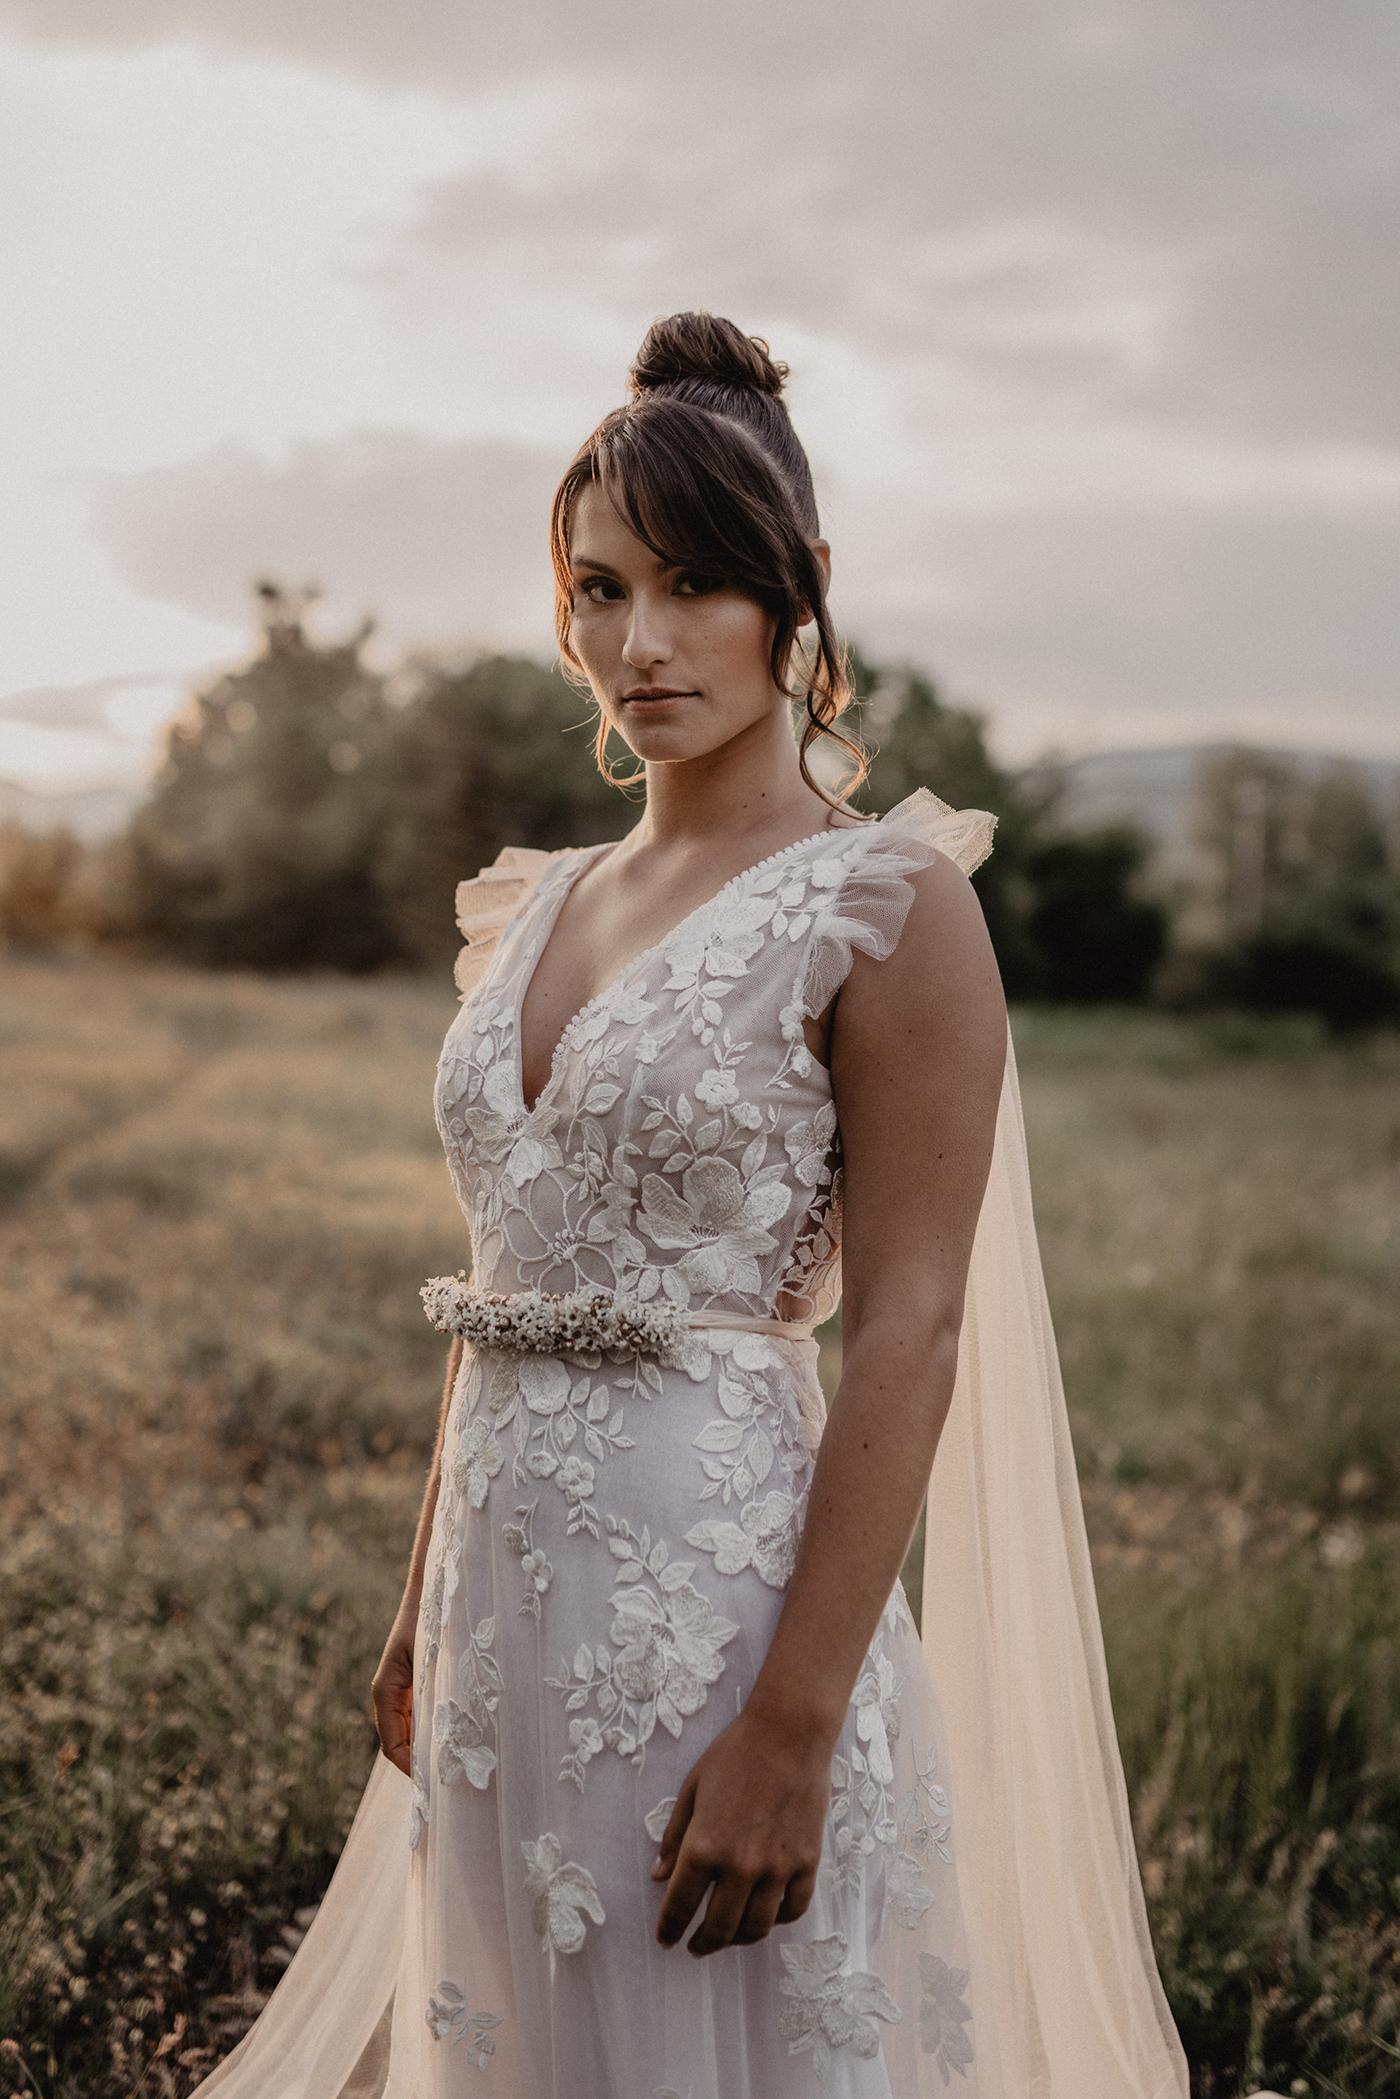 robe-de-mariage-champetre